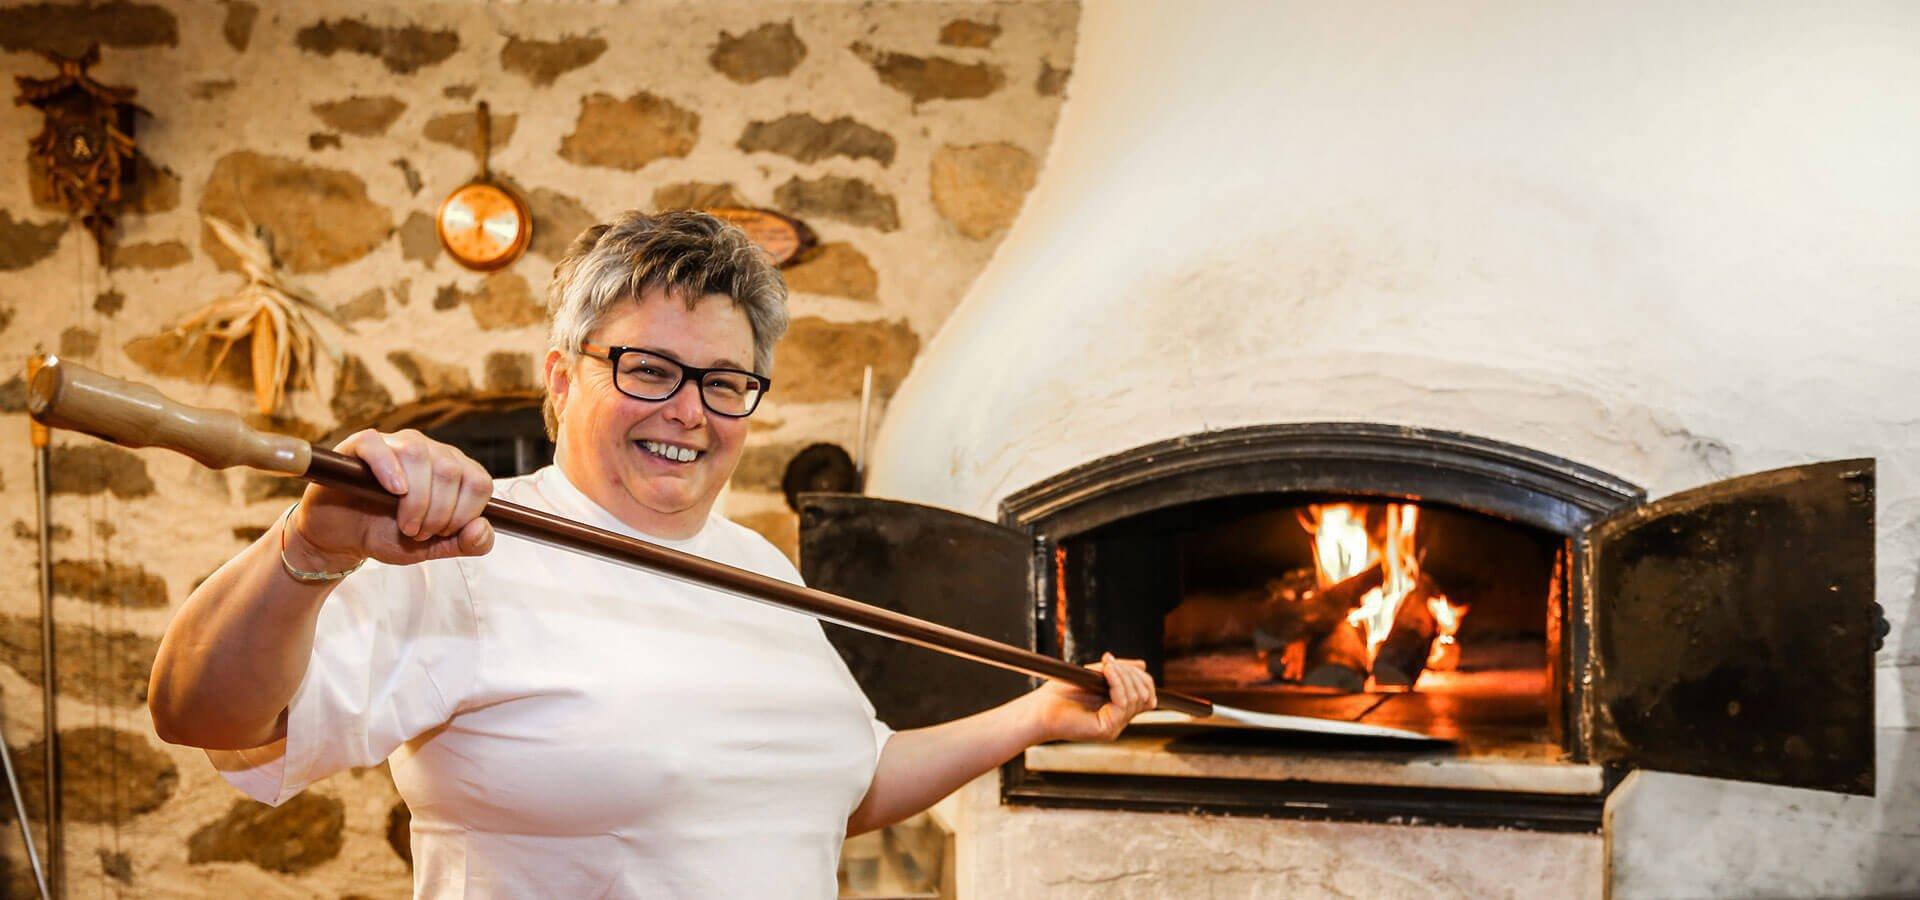 pizzeria-kircher-sepp-barbian